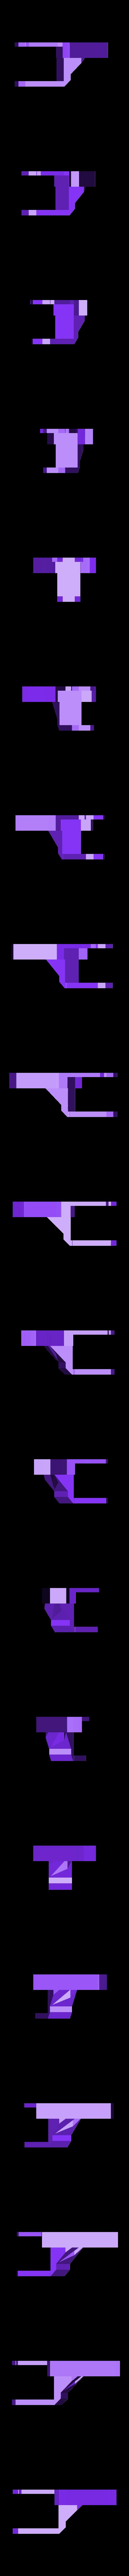 Leg_R_Top.stl Download free STL file Quadruped Walker Robot • 3D print object, indigo4